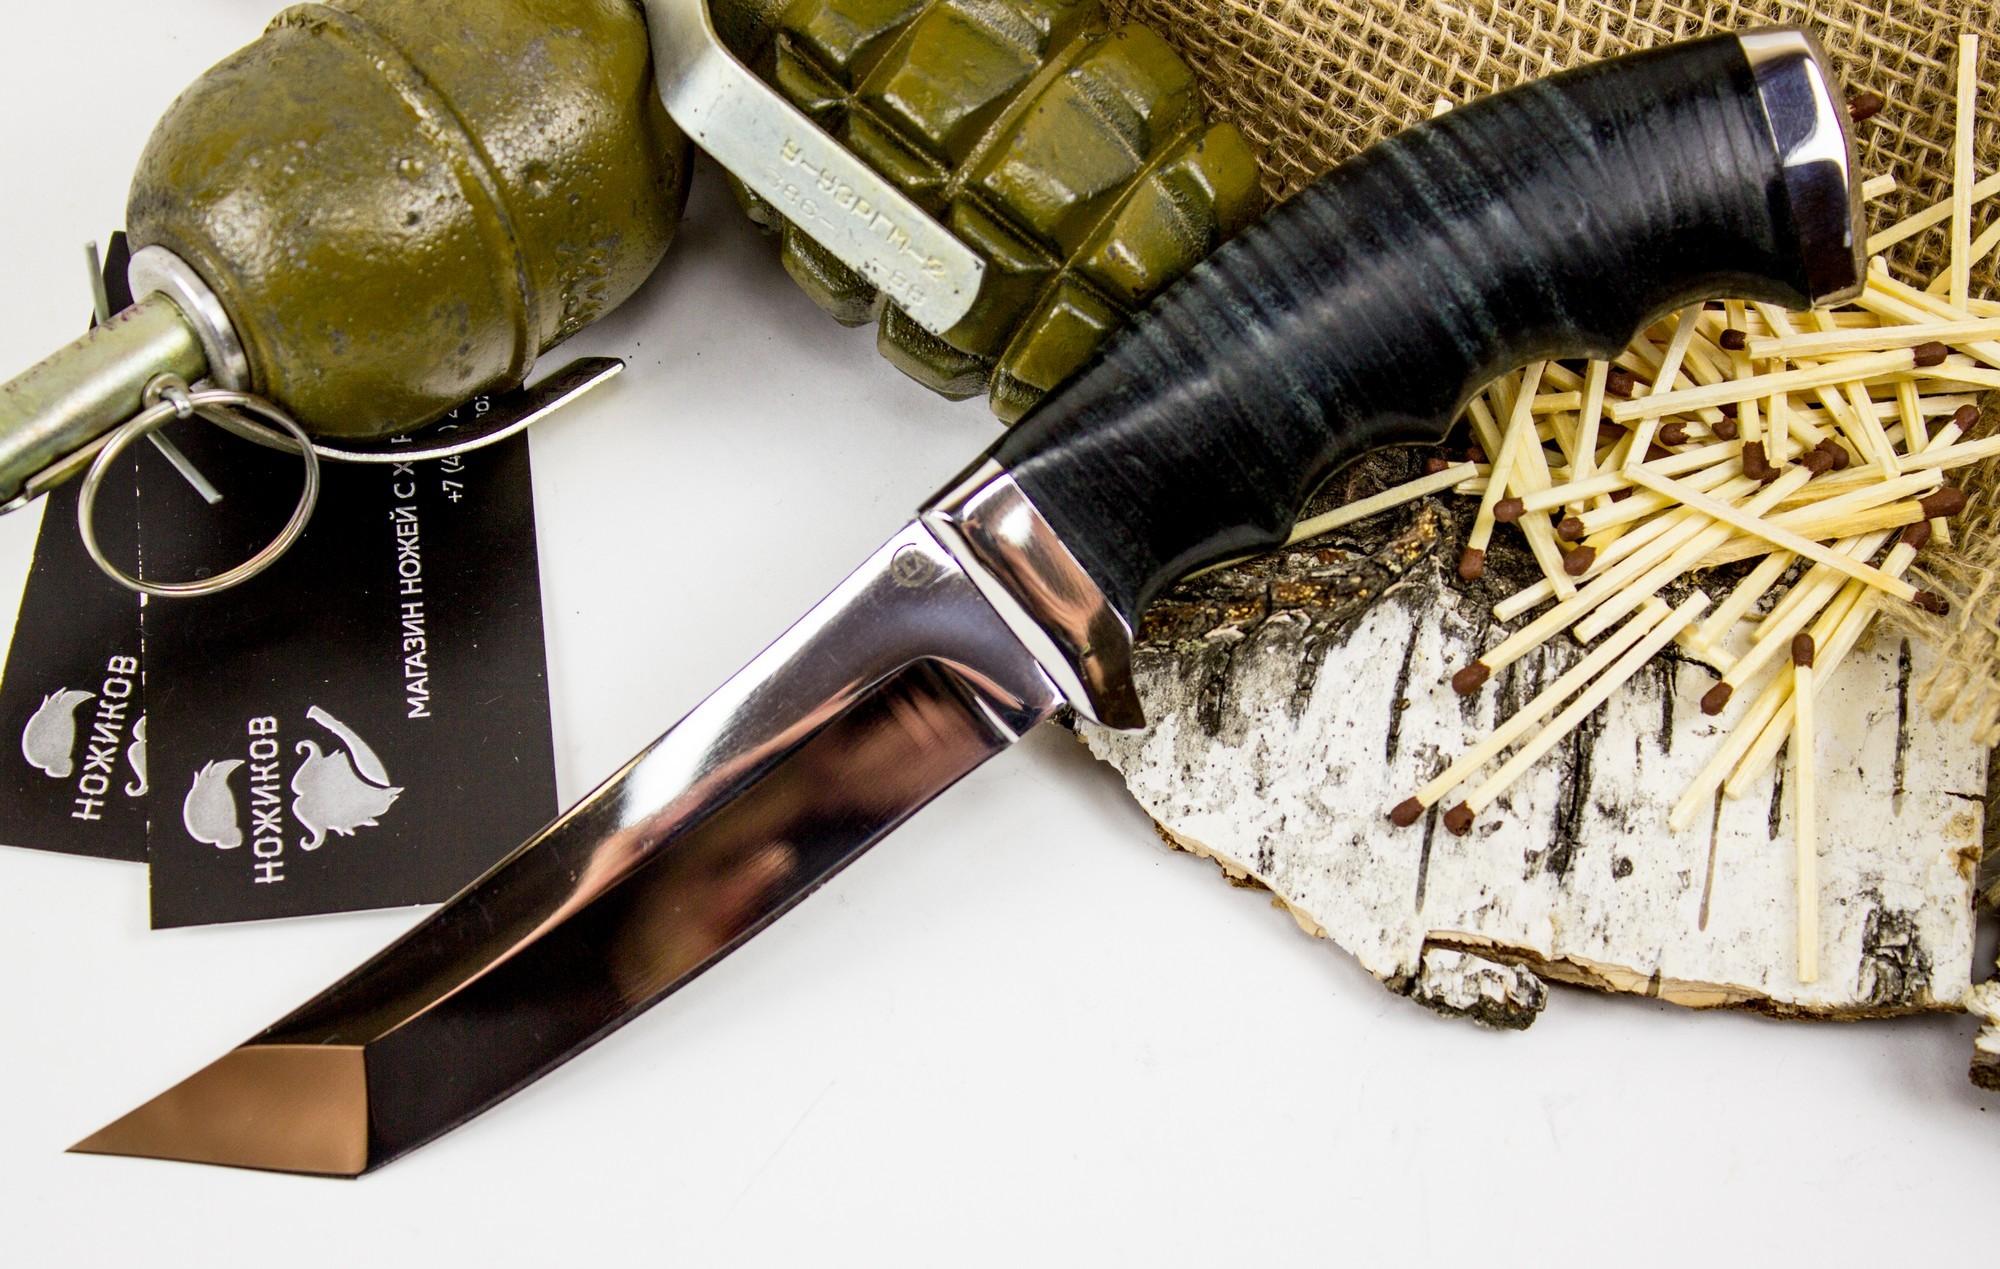 Нож Аркан, сталь 95х18, кожа от Титов и Солдатова